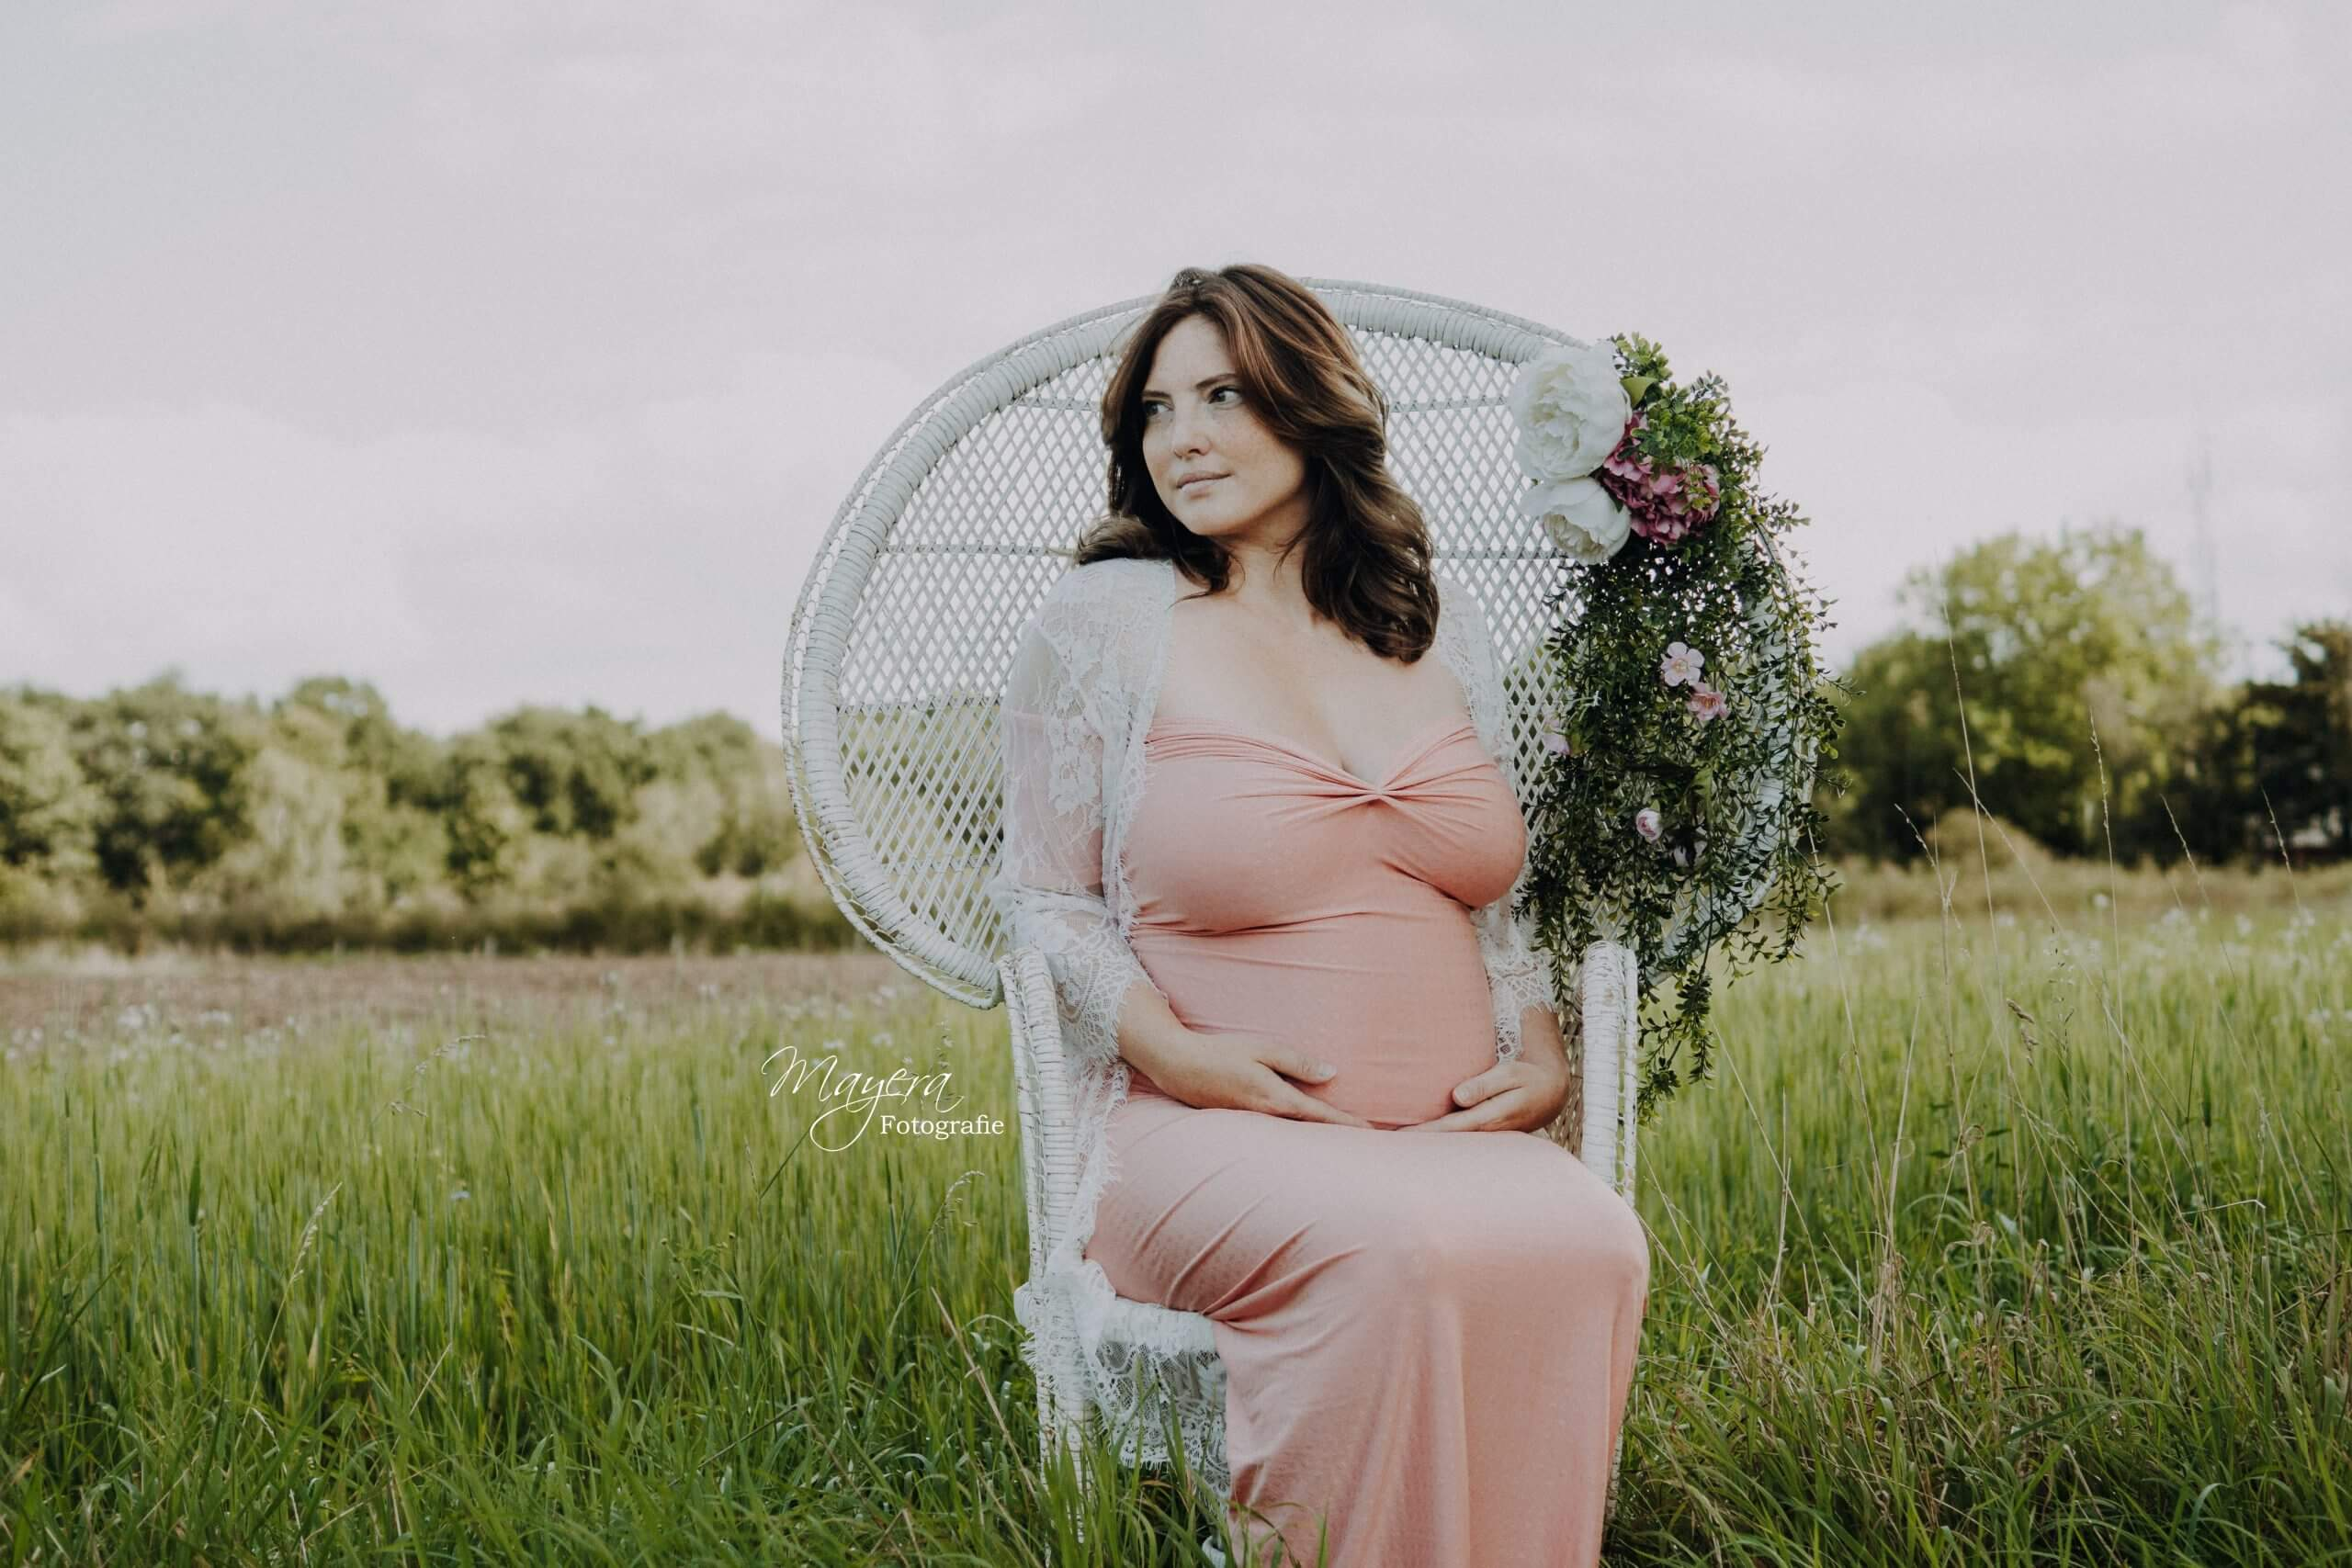 romantisch vintage fotoshoot zwangerschap